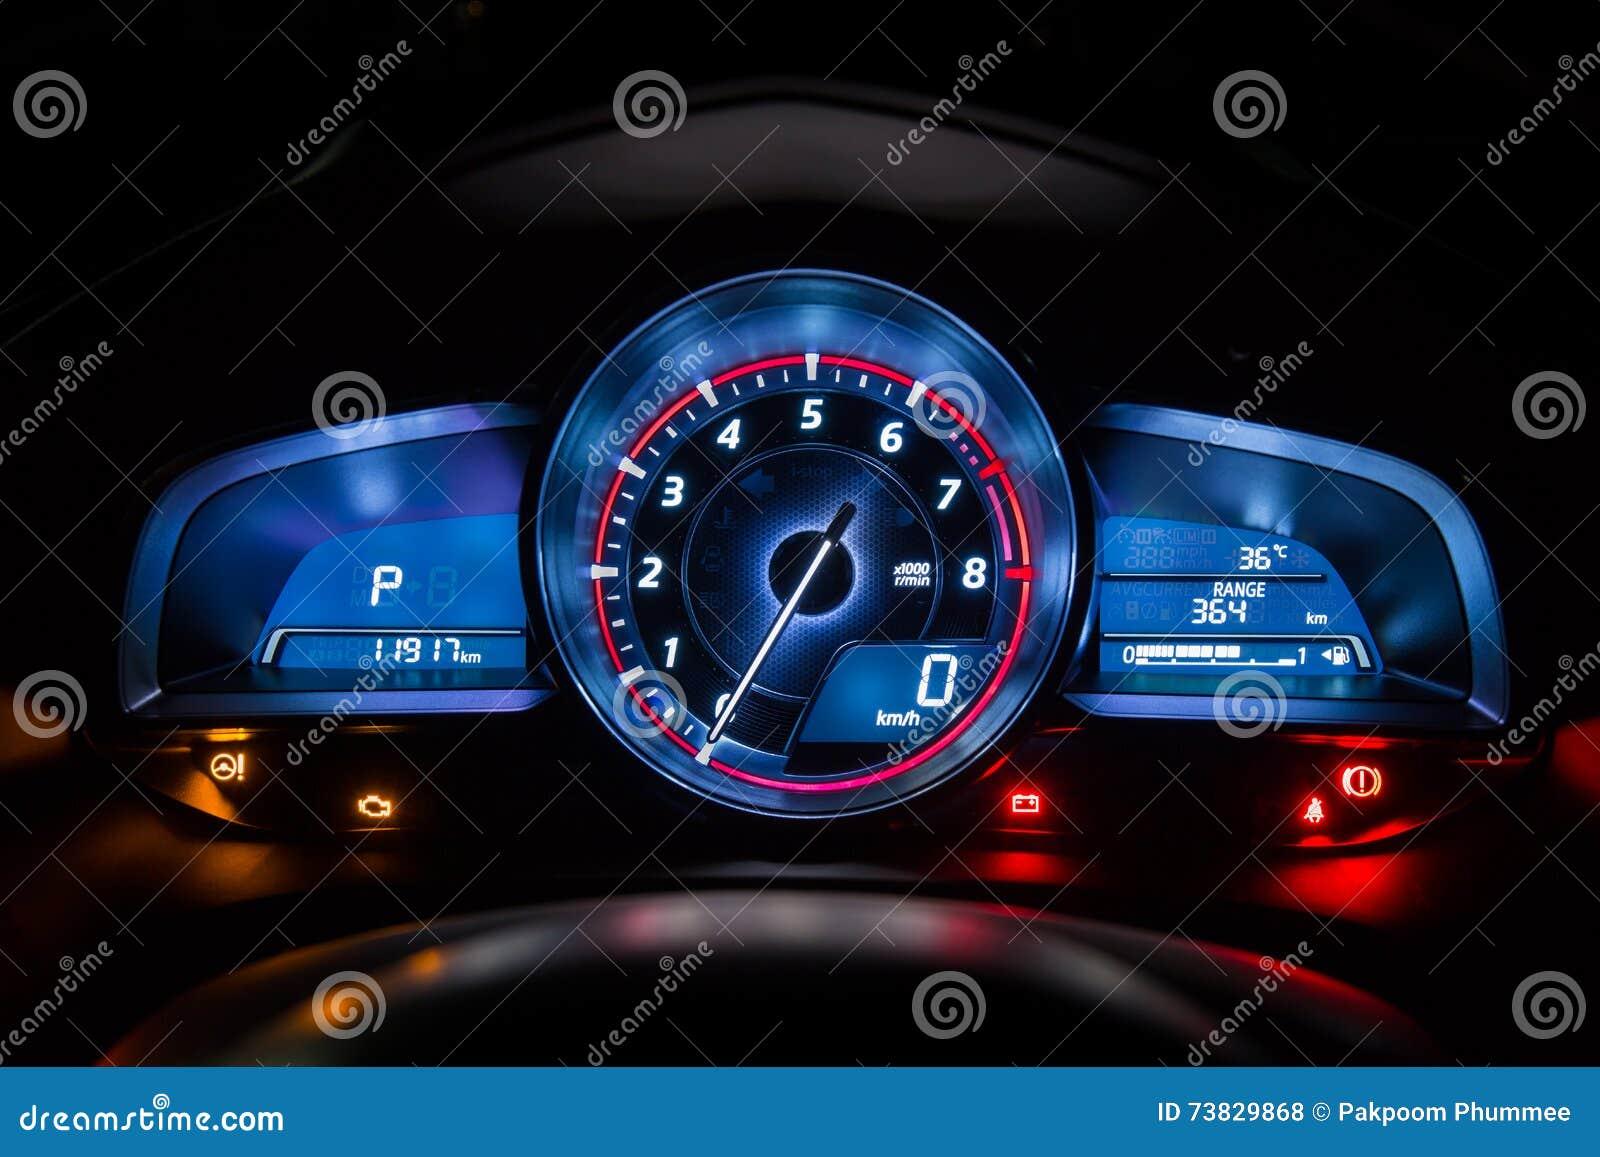 Modern car instrument dashboard panel or speedometer